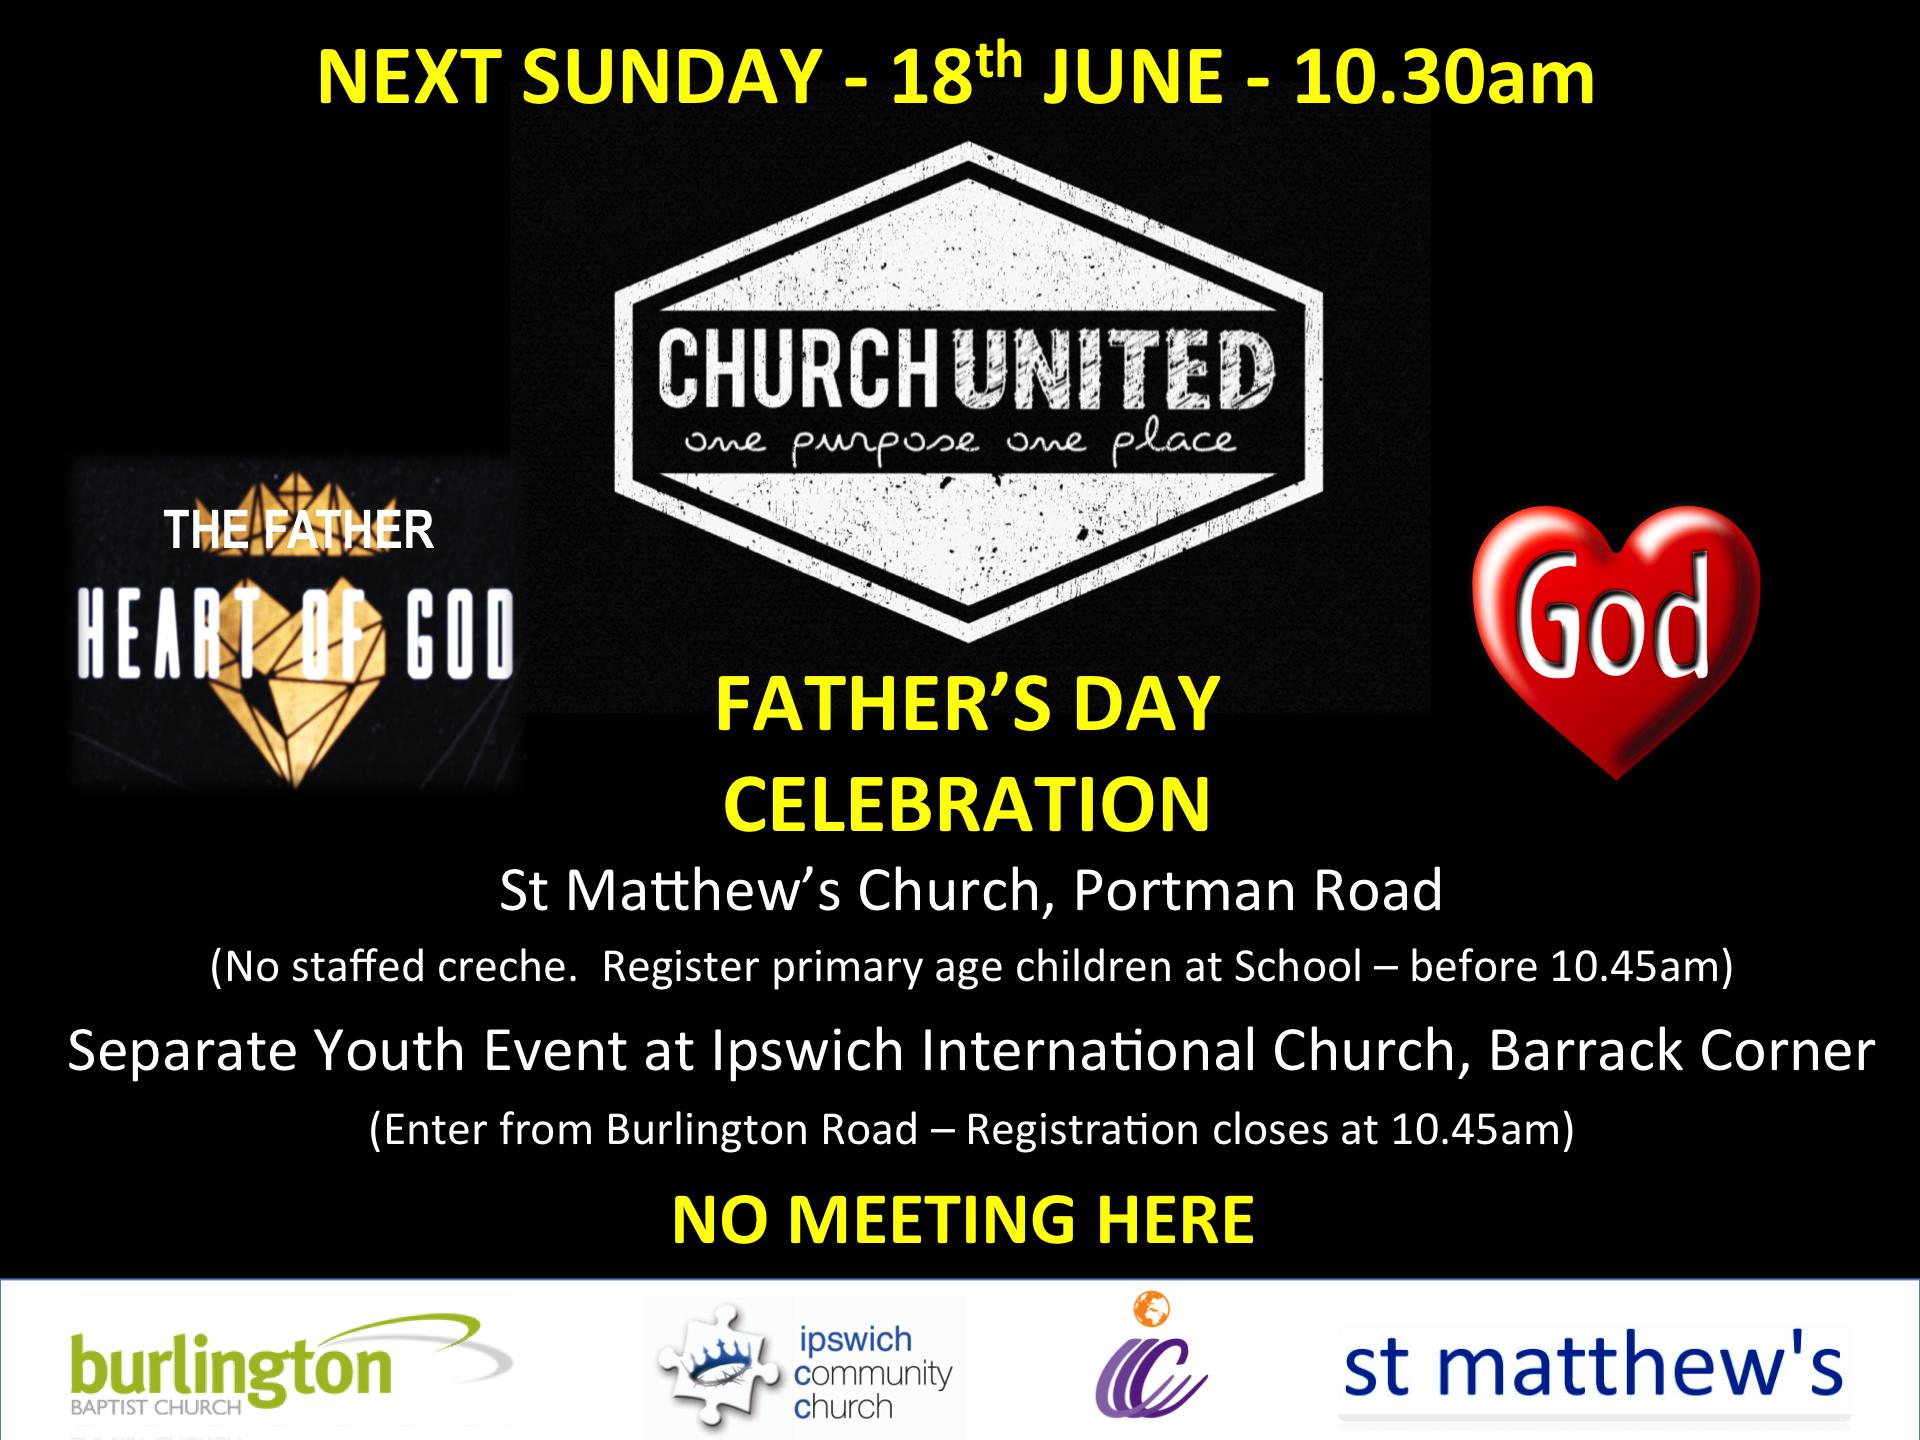 IMG-Church United Ad